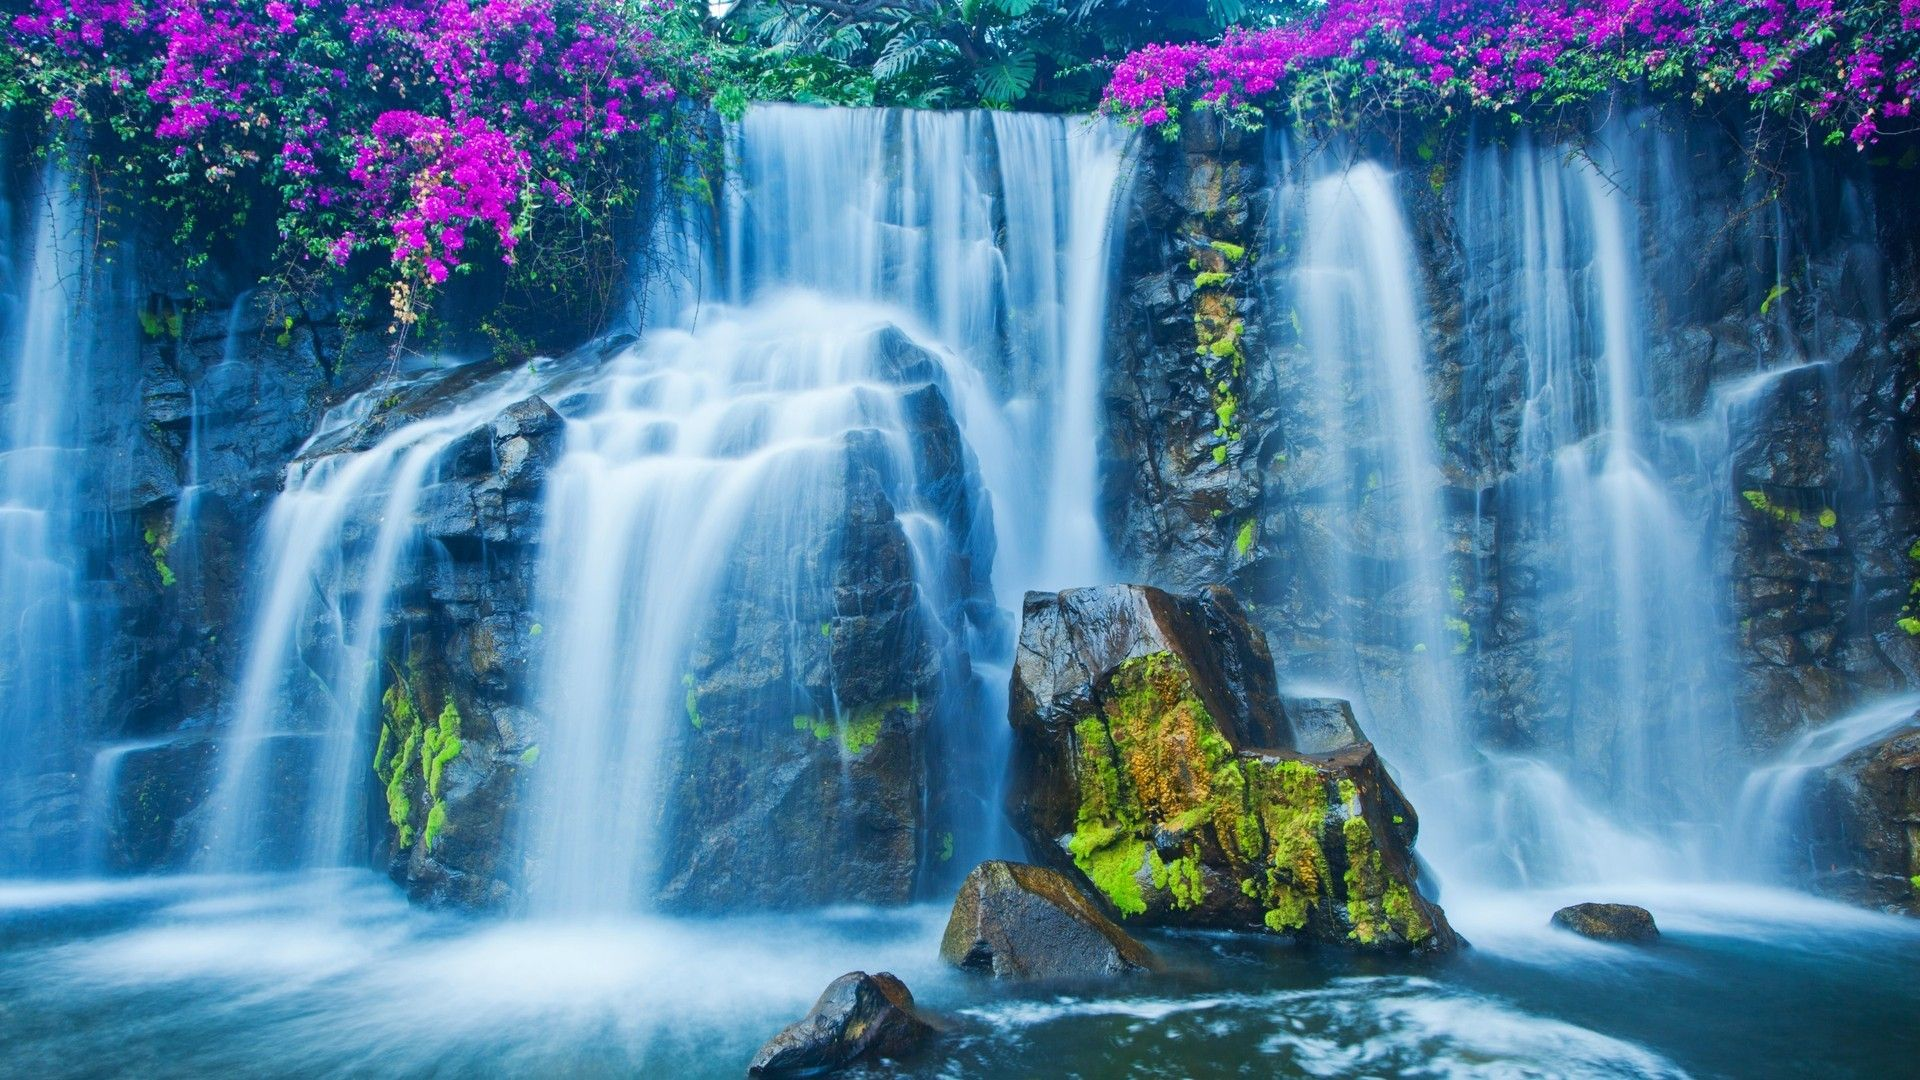 Pin By Diane Mckenna On Heaven S Canvas God S Artwork Waterfall Wallpaper Waterfall Beautiful Waterfalls